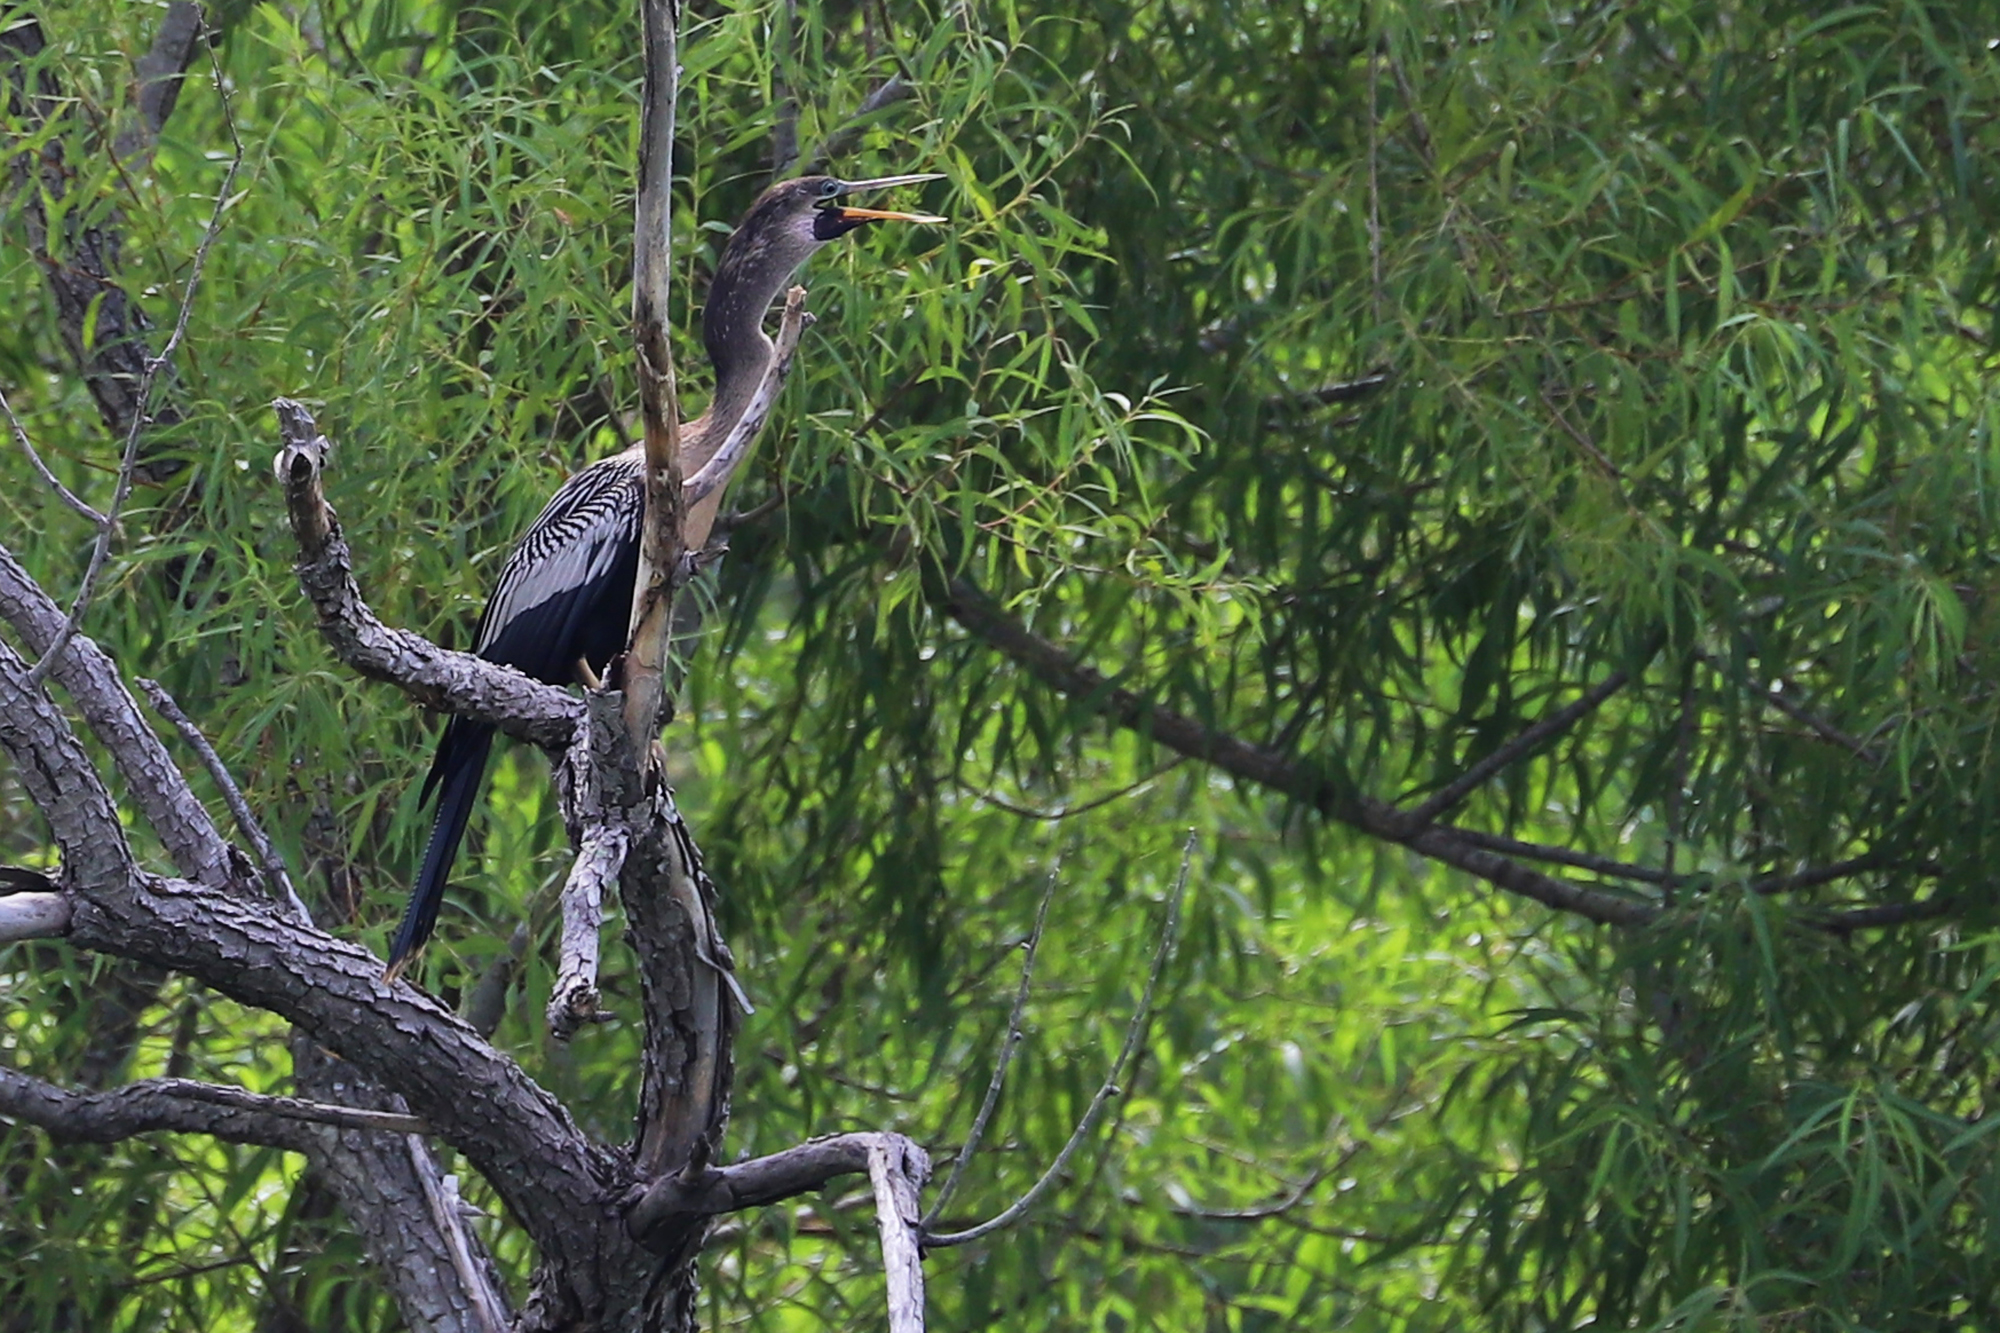 Anhinga / 4 Jul / Rock Creek Recreation Area (Private)